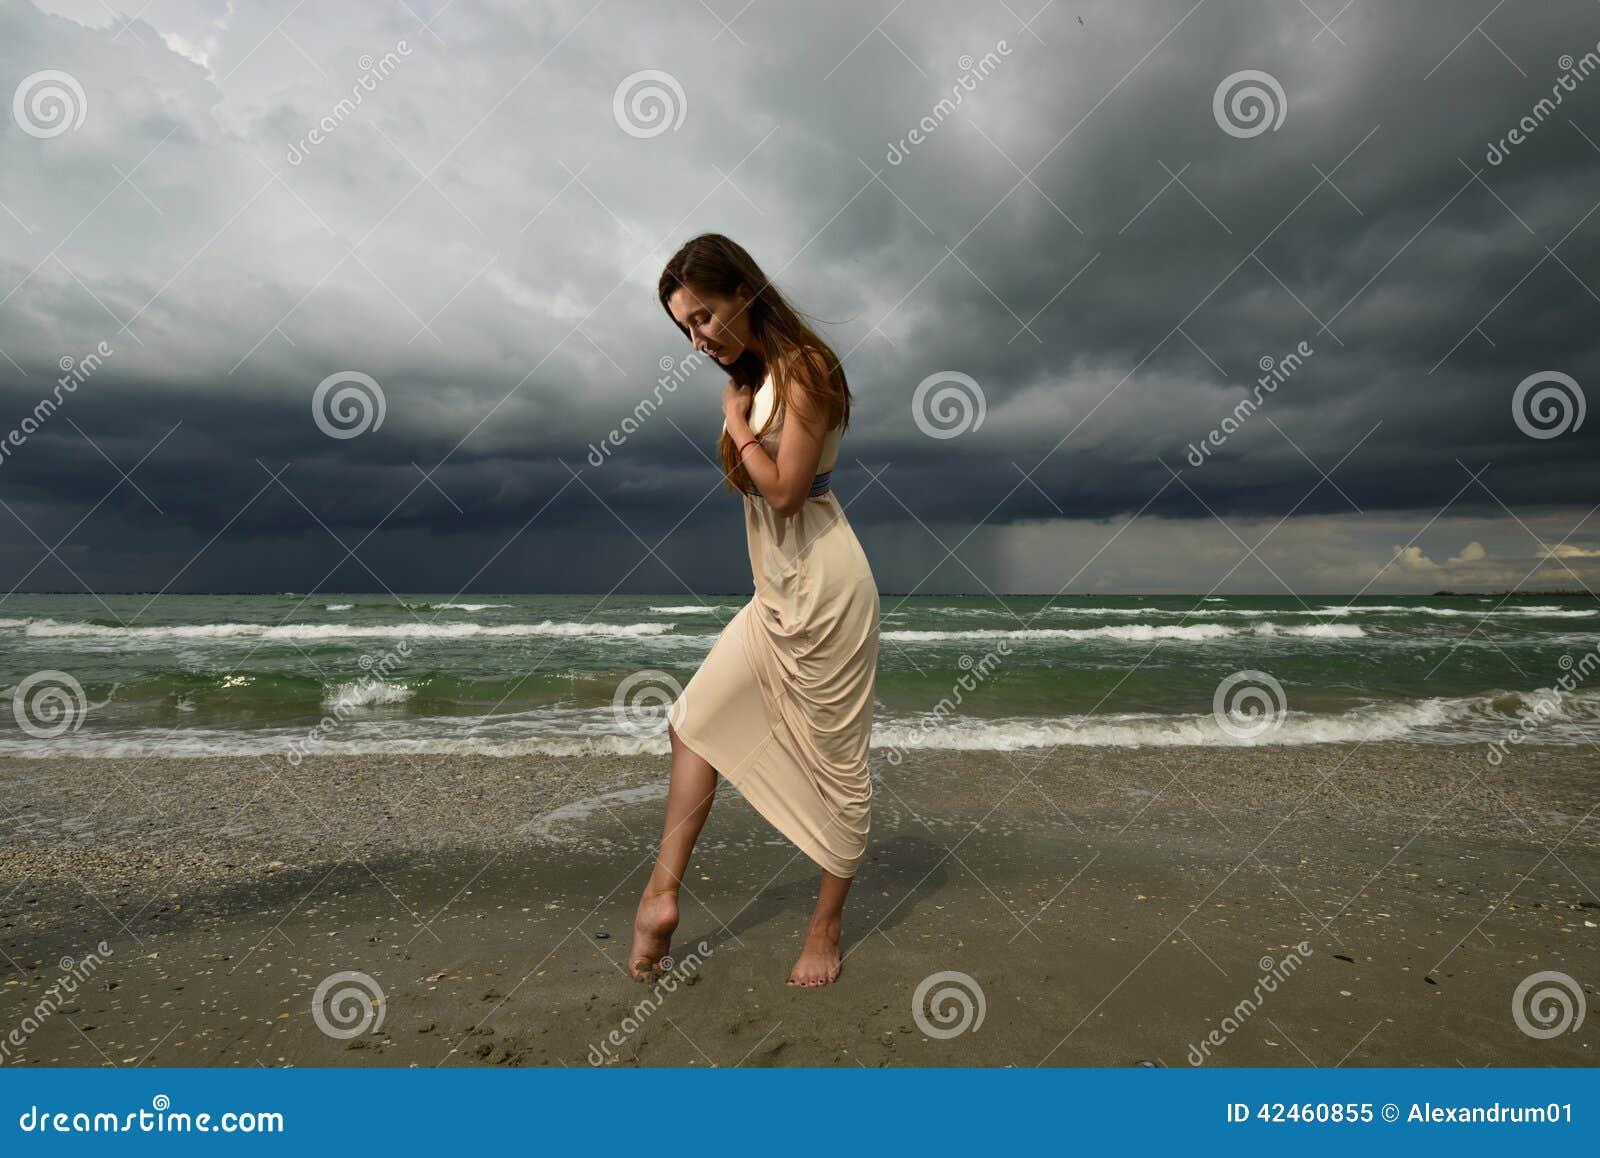 Frau auf einem Strand bei dem Sonnenuntergang